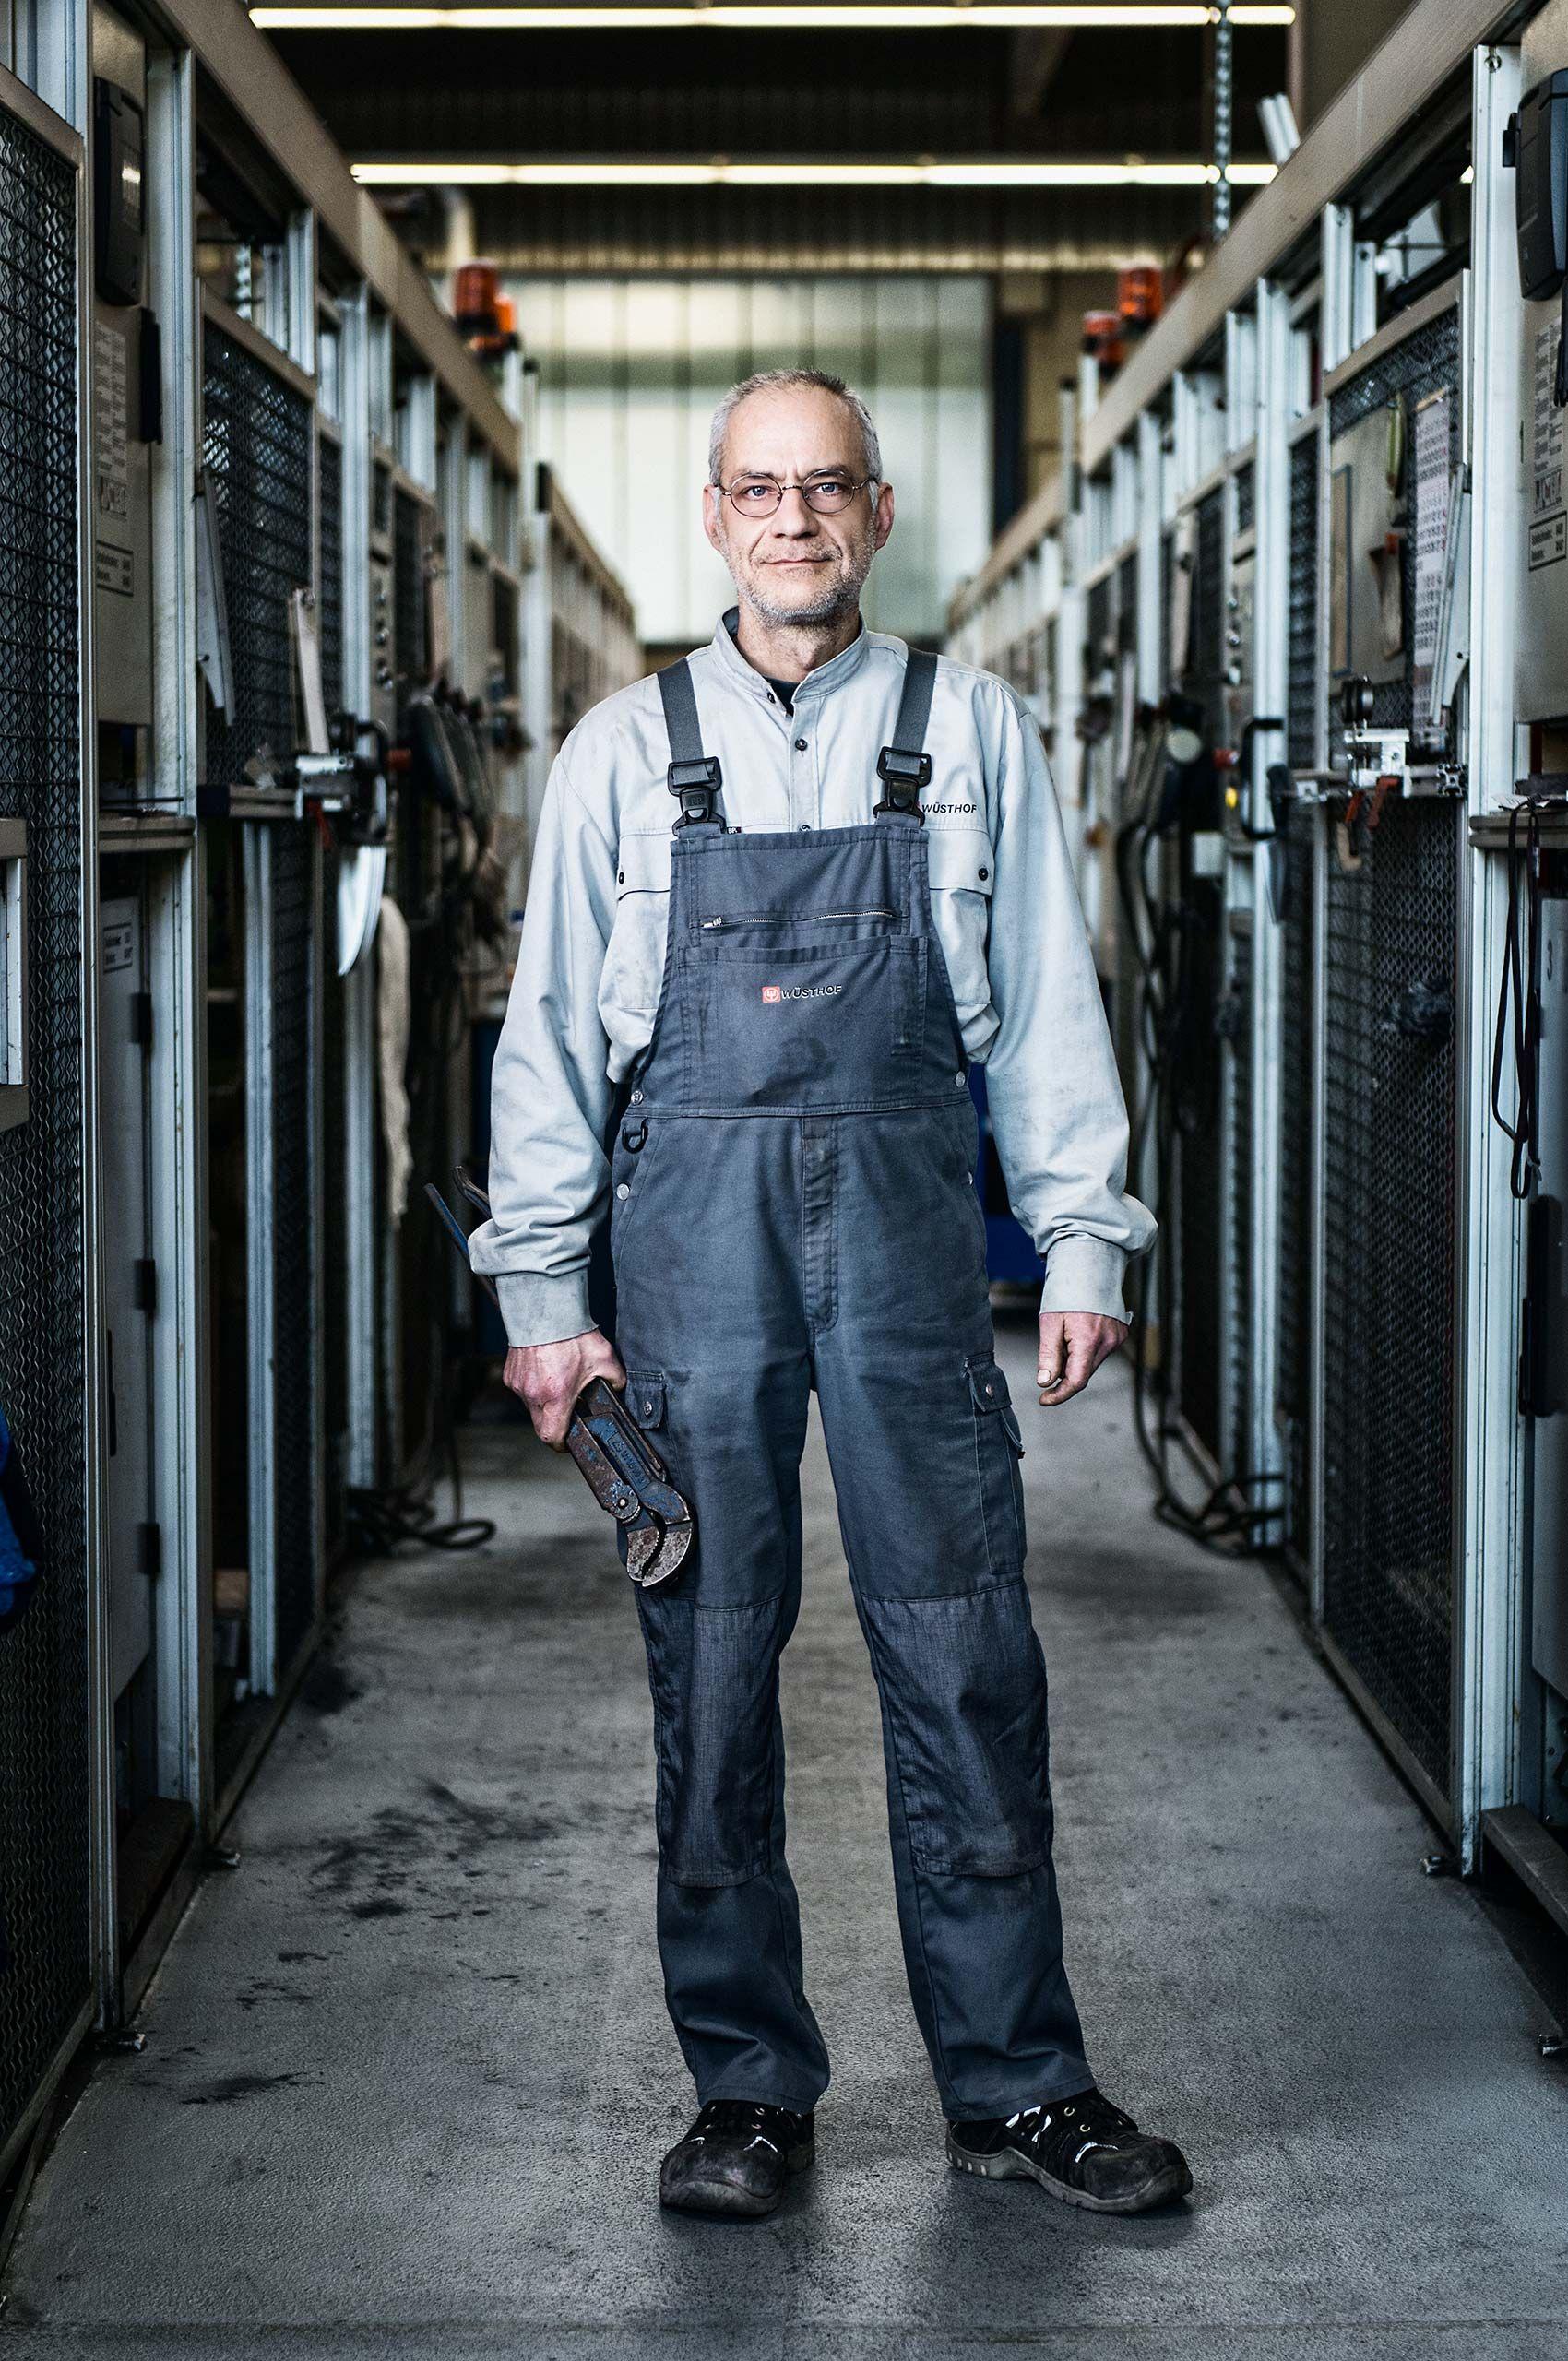 veteran-worker-wusthof-factory-HenrikOlundPhotography..jpg